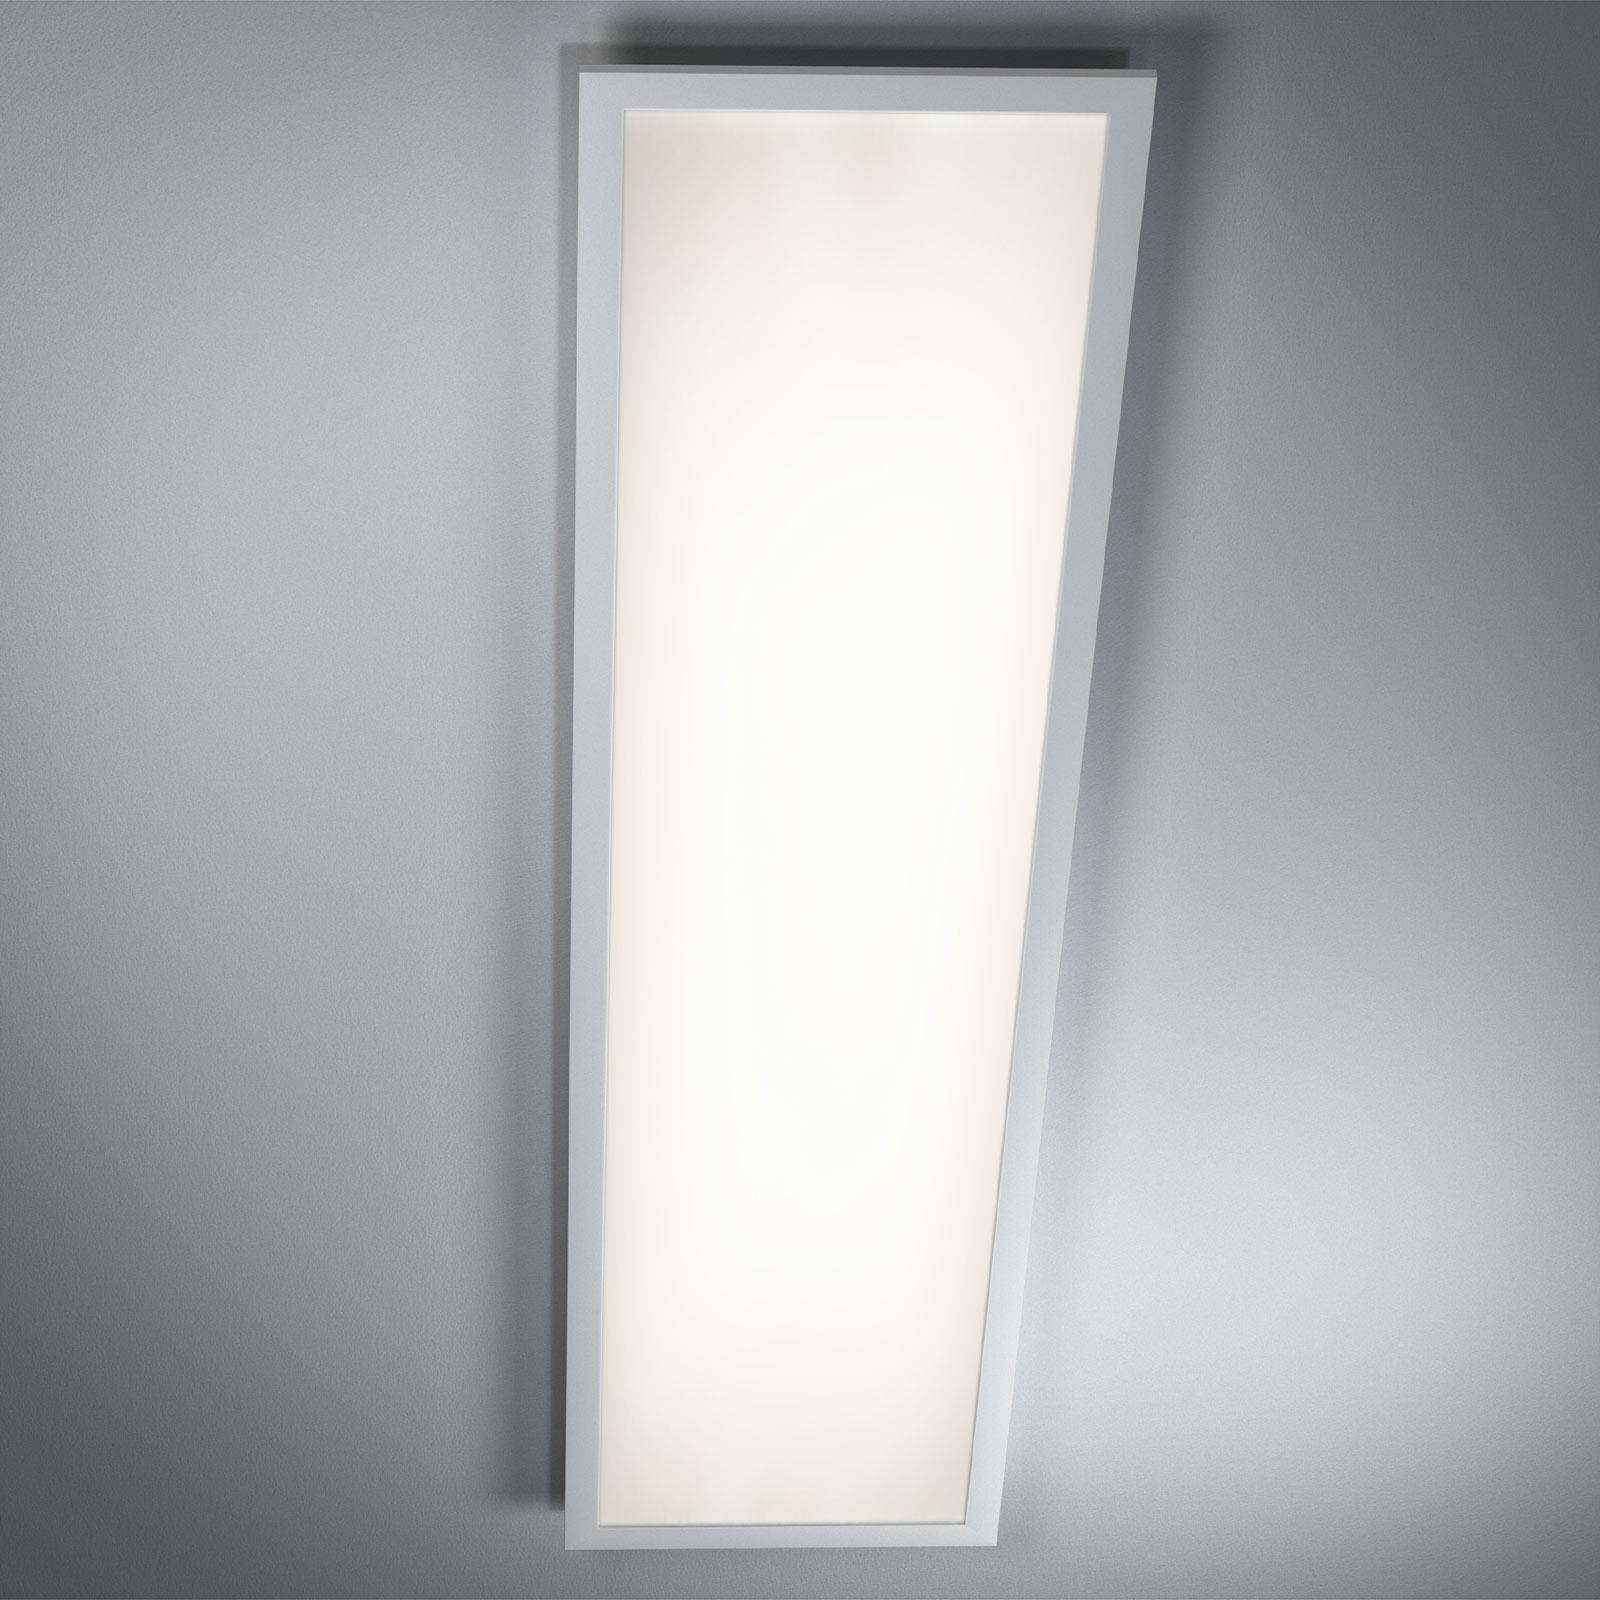 LEDVANCE Planon Plus LED-panel 120 x 30 cm 830 36W